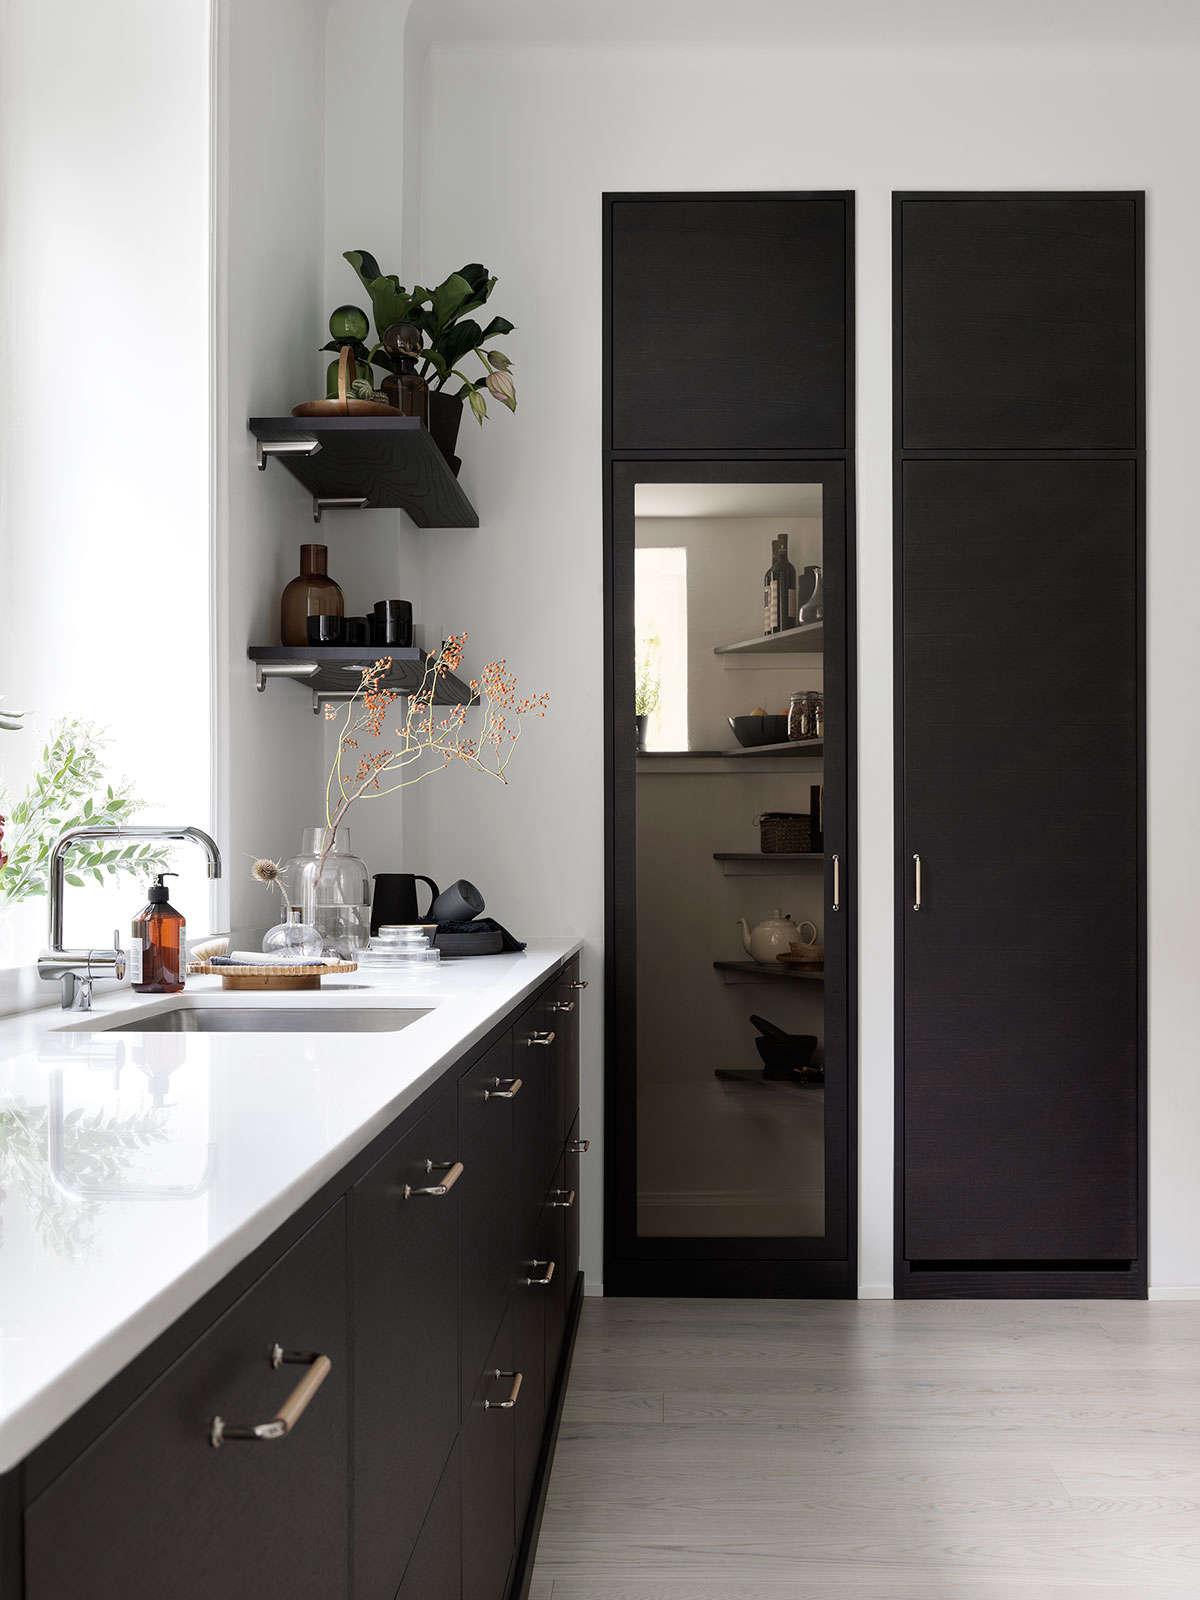 bistro kitchen in ash brown by ballingslov of sweden remodelista 3 10